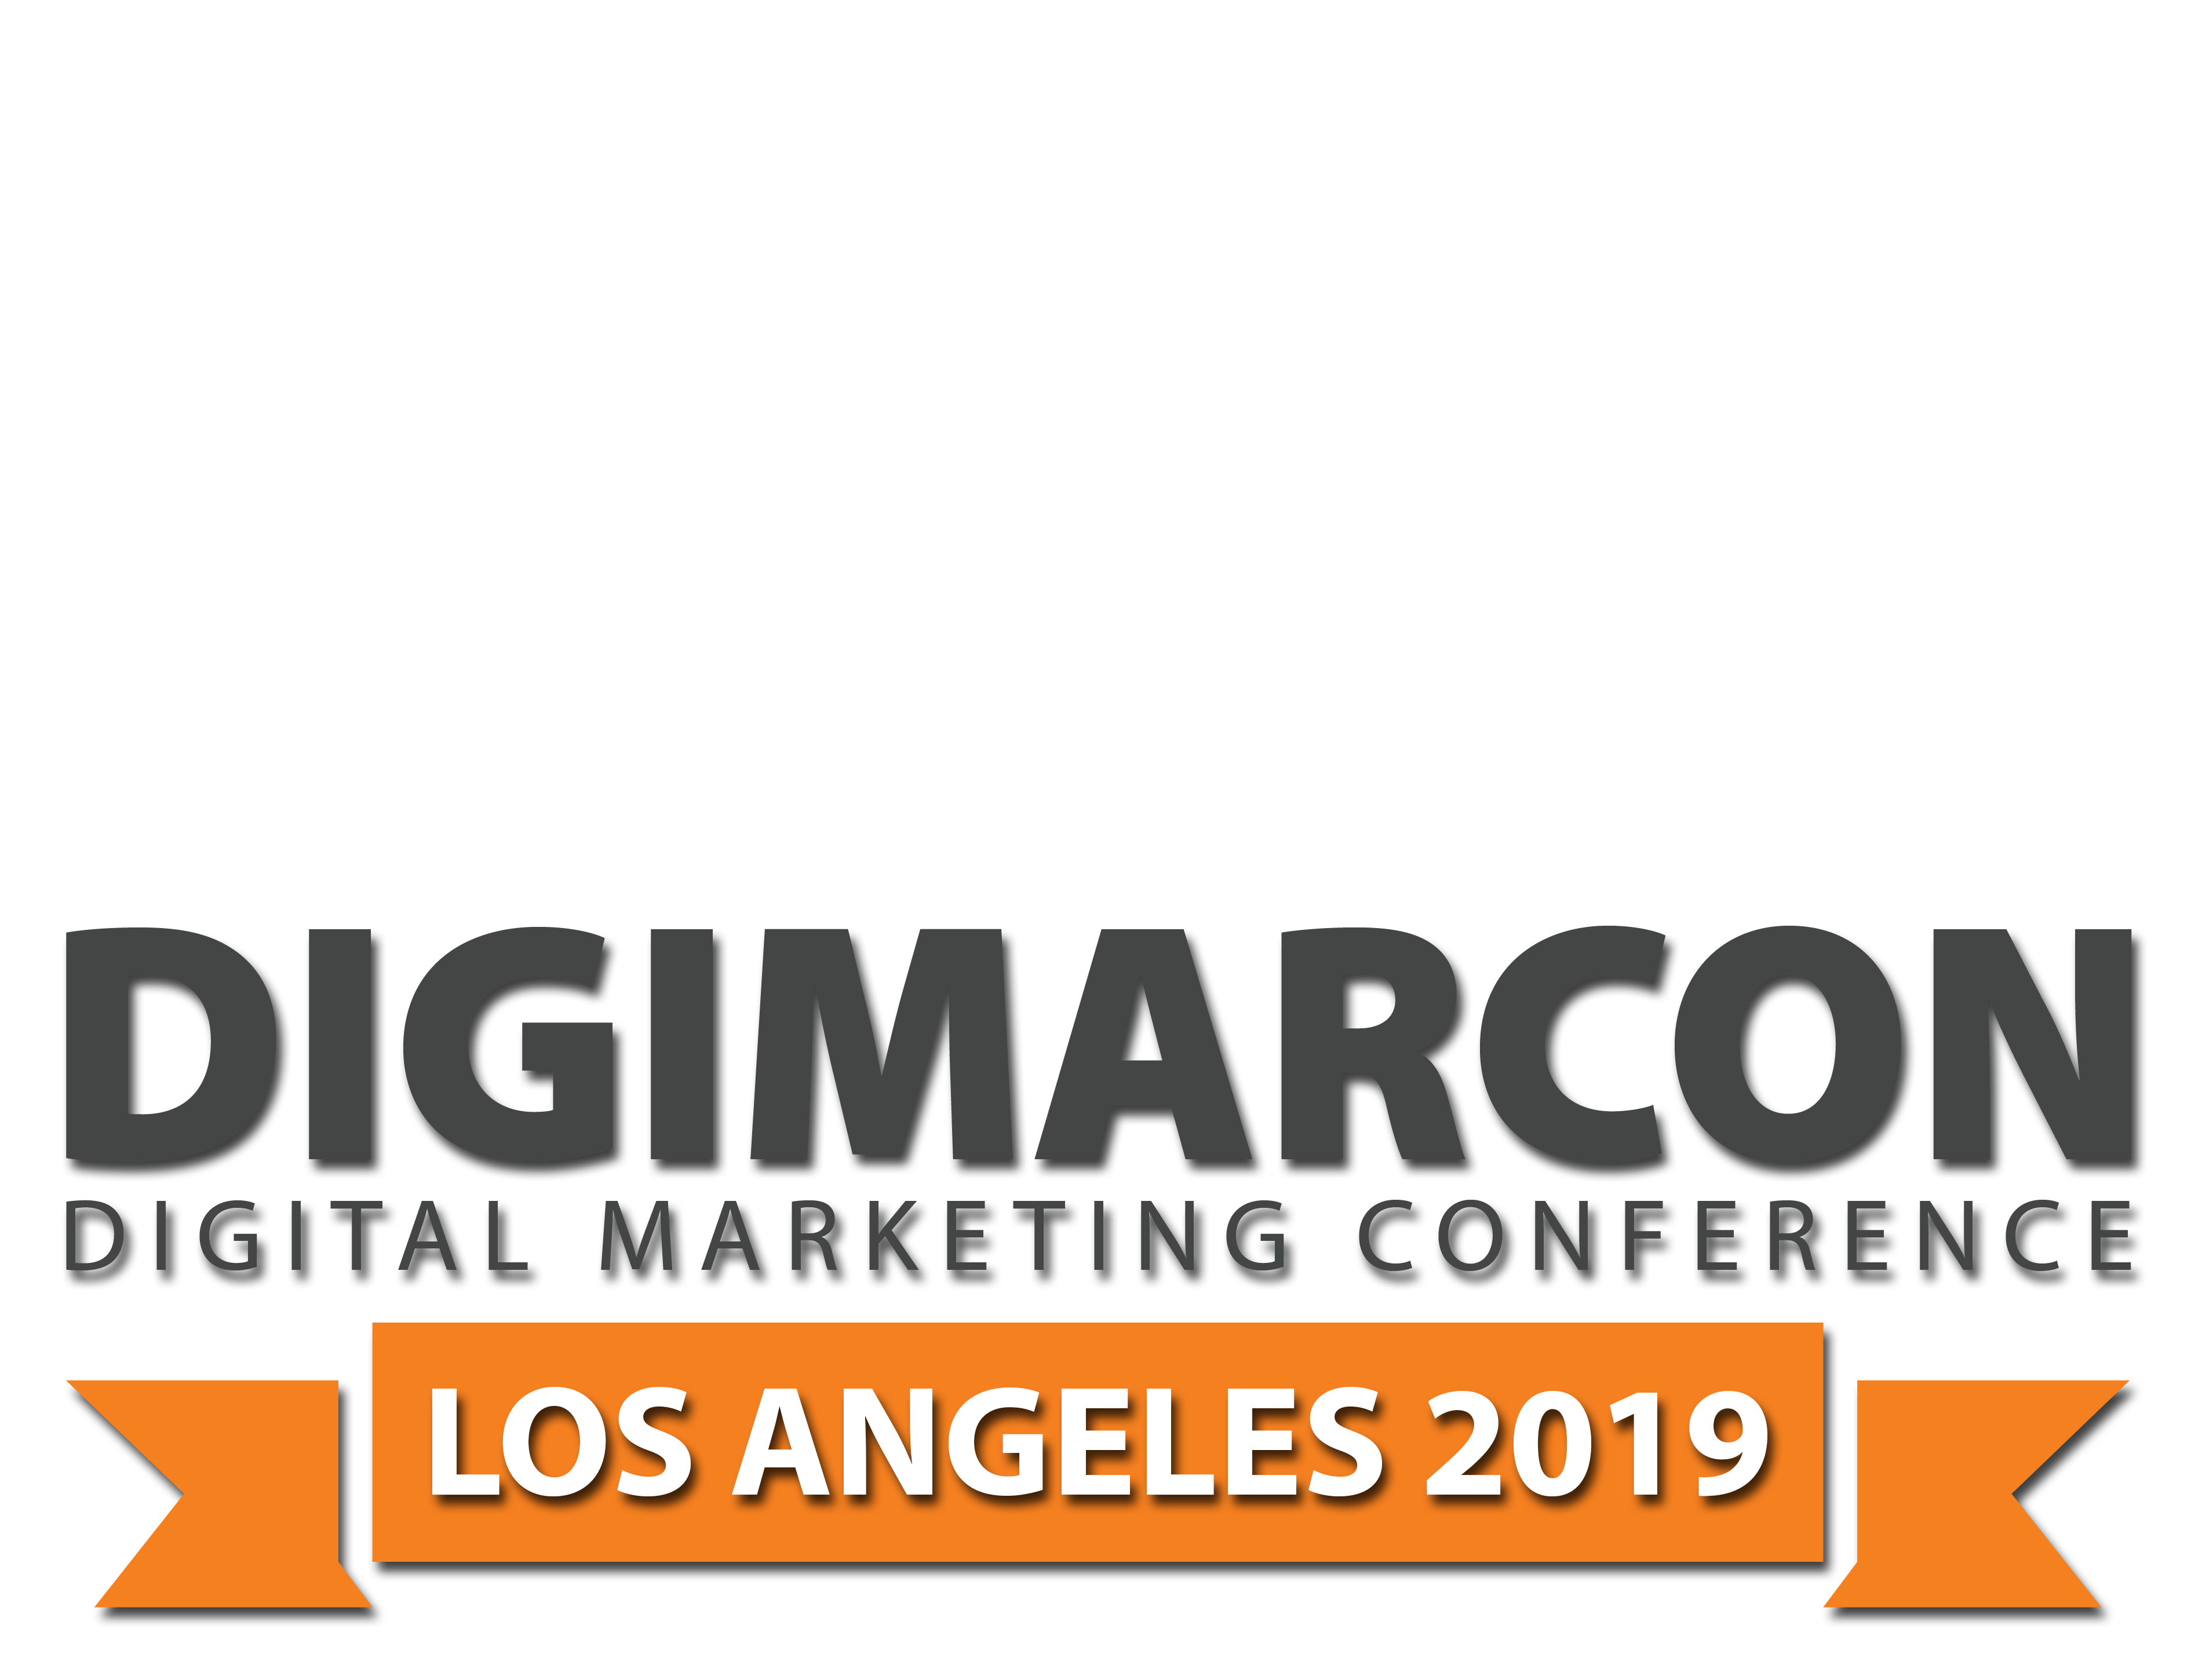 DigiMarCon Los Angeles 2019 · June 12 - 13, 2019 · Digital Marketing